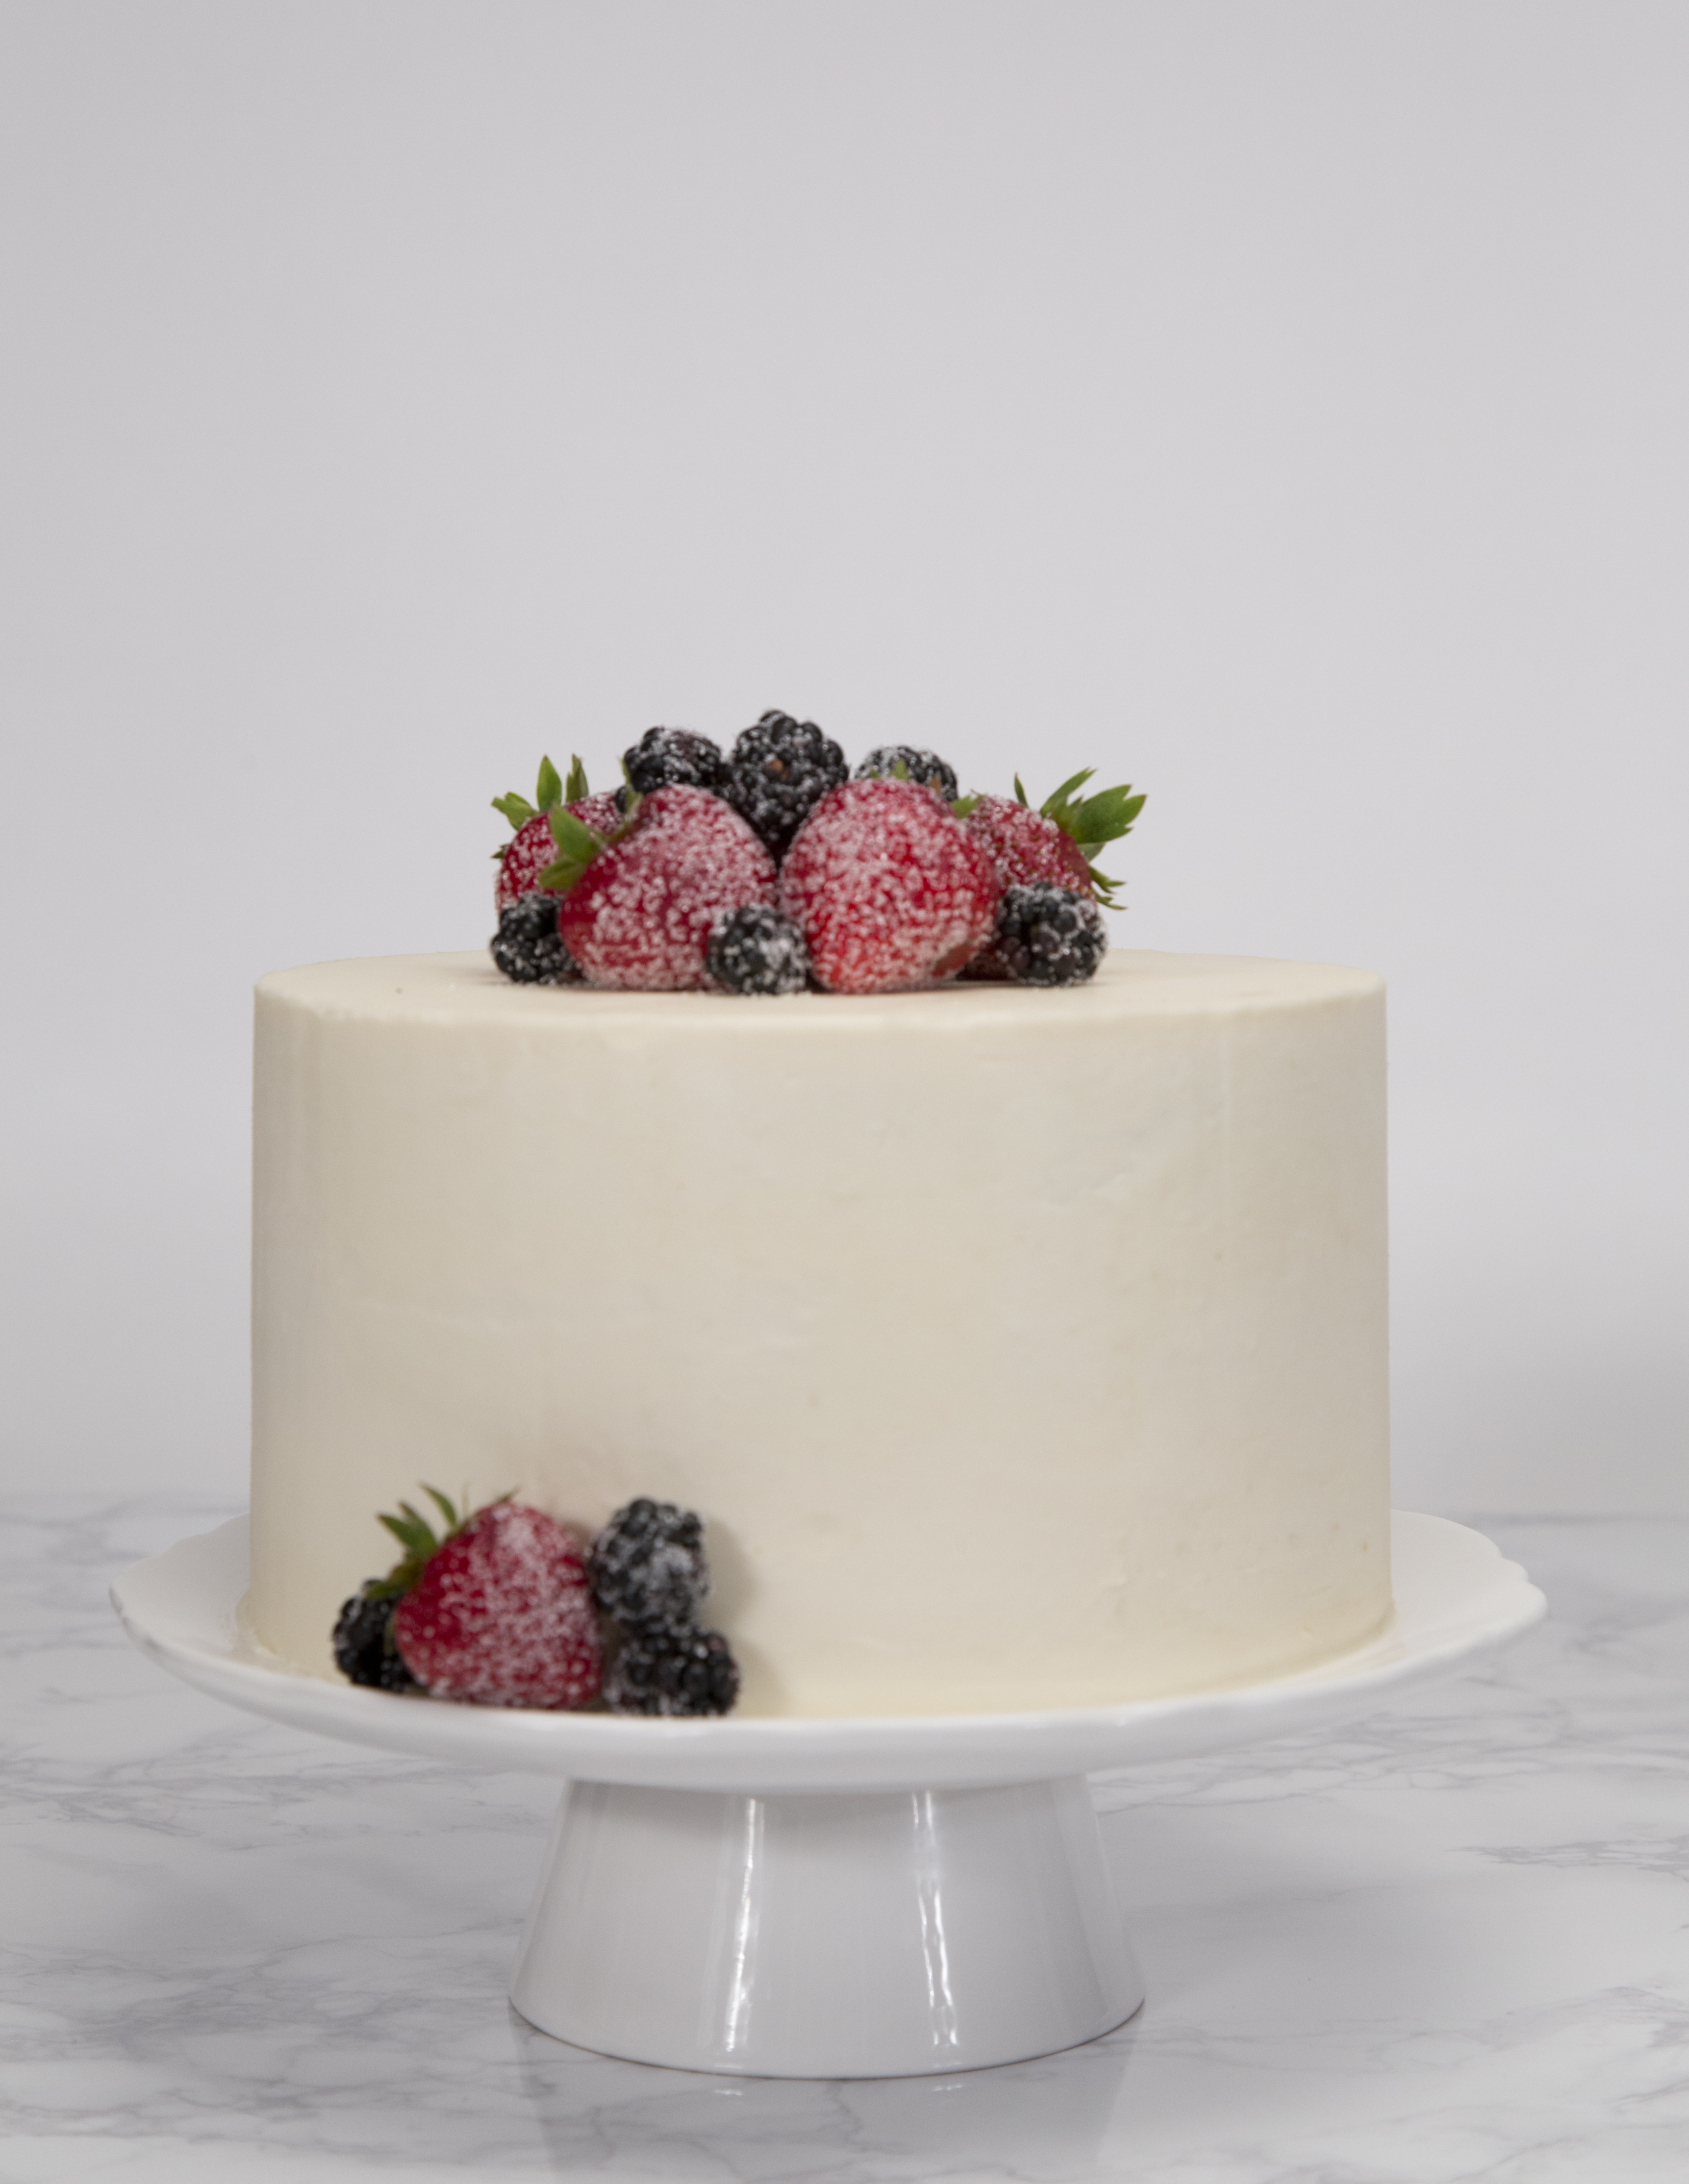 sugarberrycake.jpg